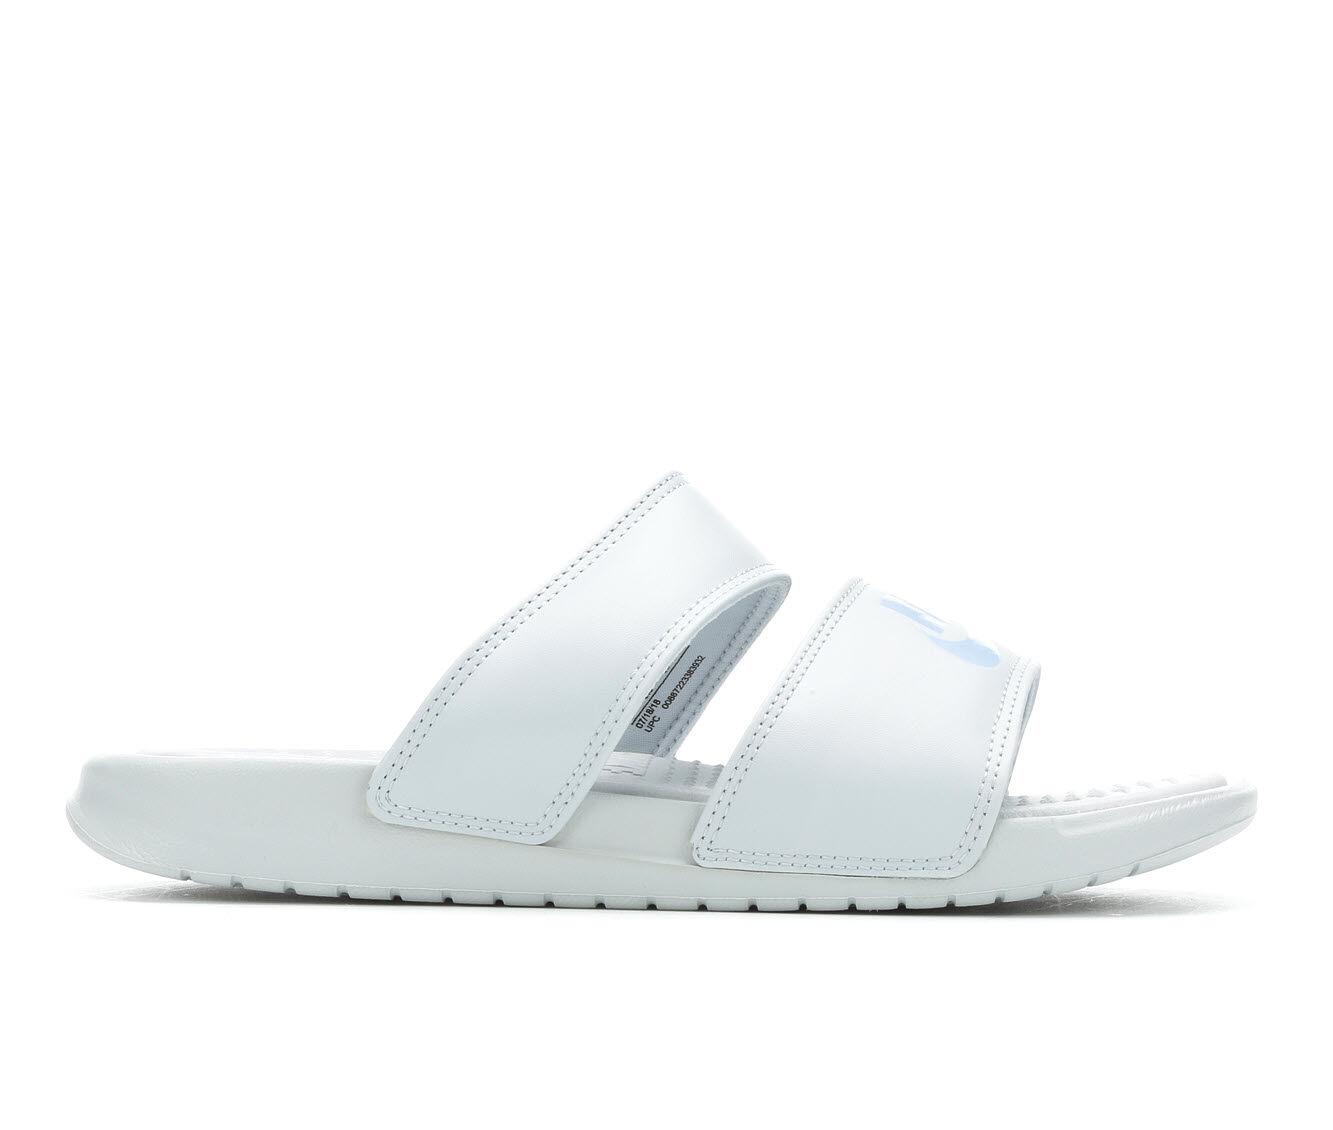 Women's Nike Benassi Duo Slide Sandals Platinum/Spruce